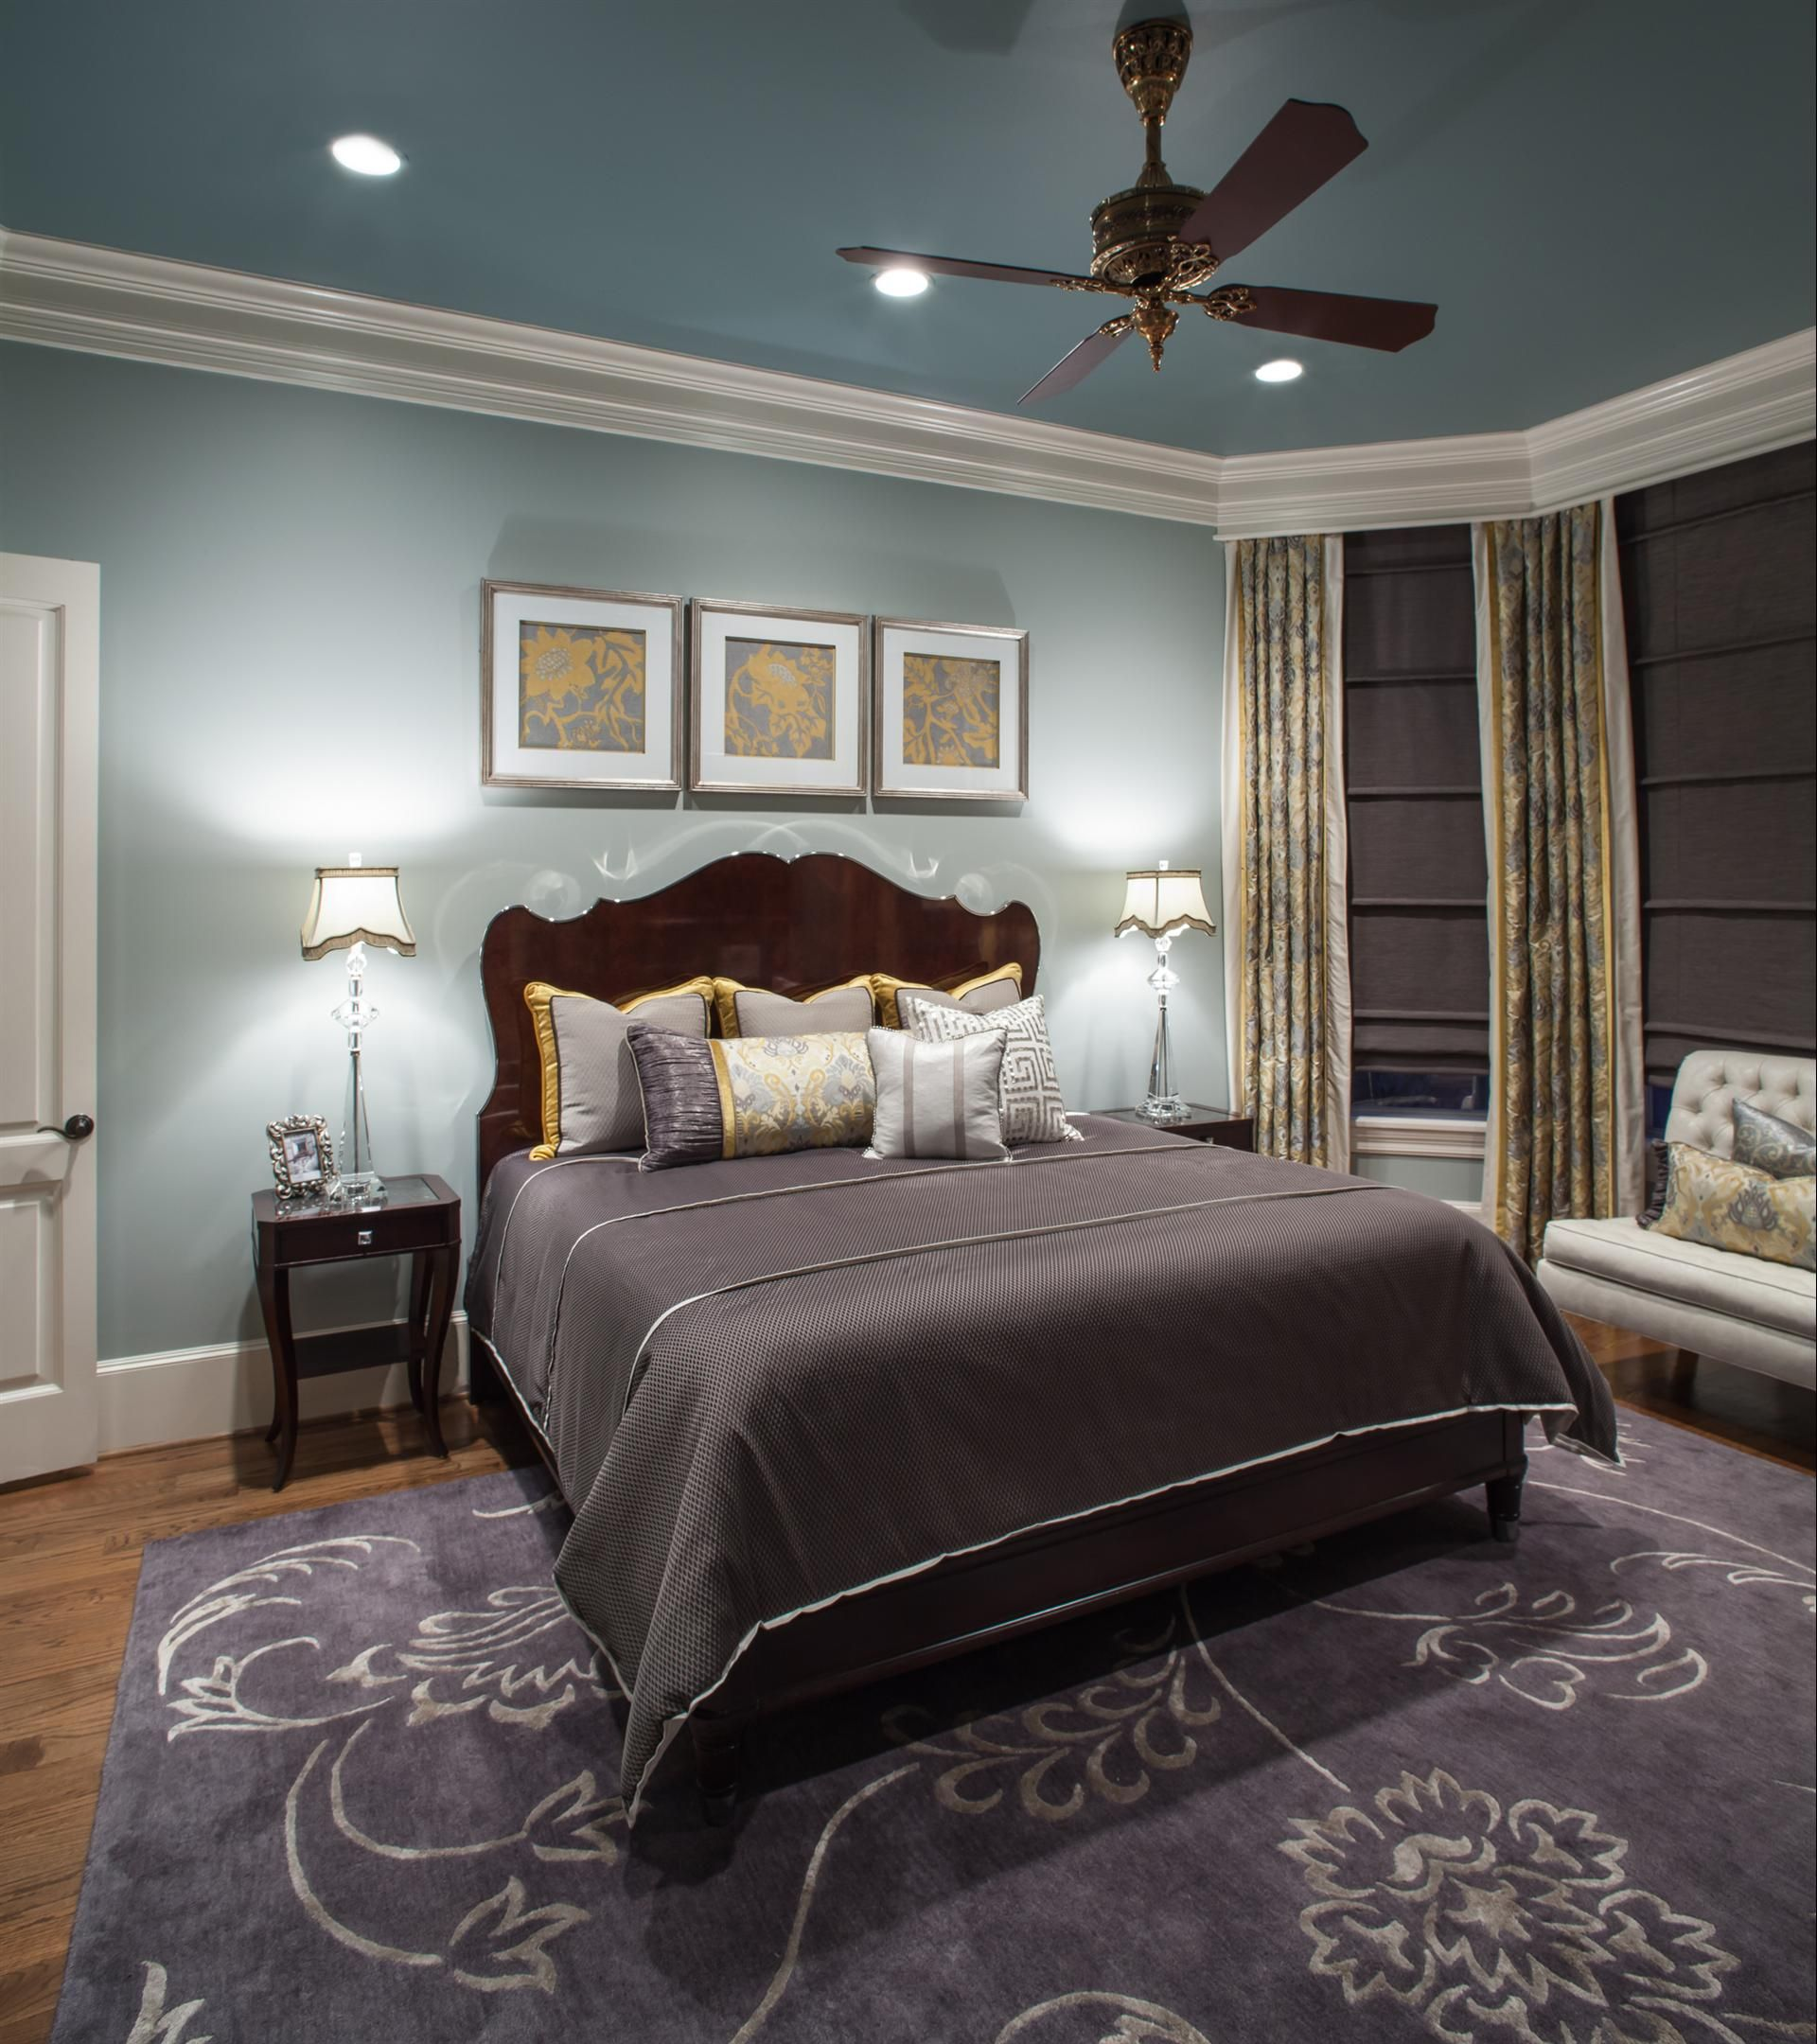 By Design Interiors Inc Houston Interior Design Firm Portfolio Interior Design Houston Interior Designers Bedroom Design